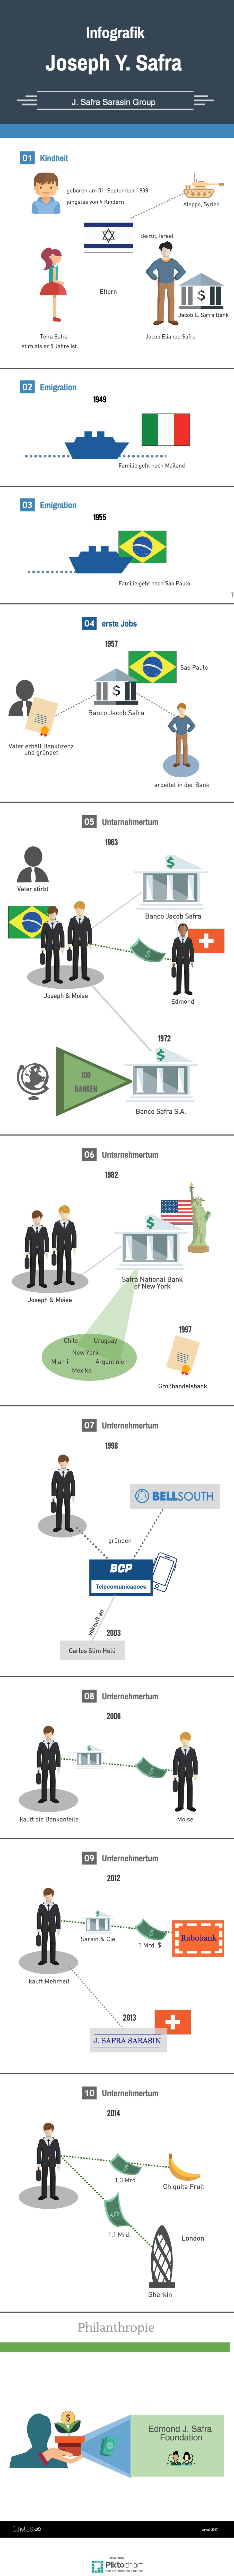 Informationsgrafik des Milliardärs Joseph Safra